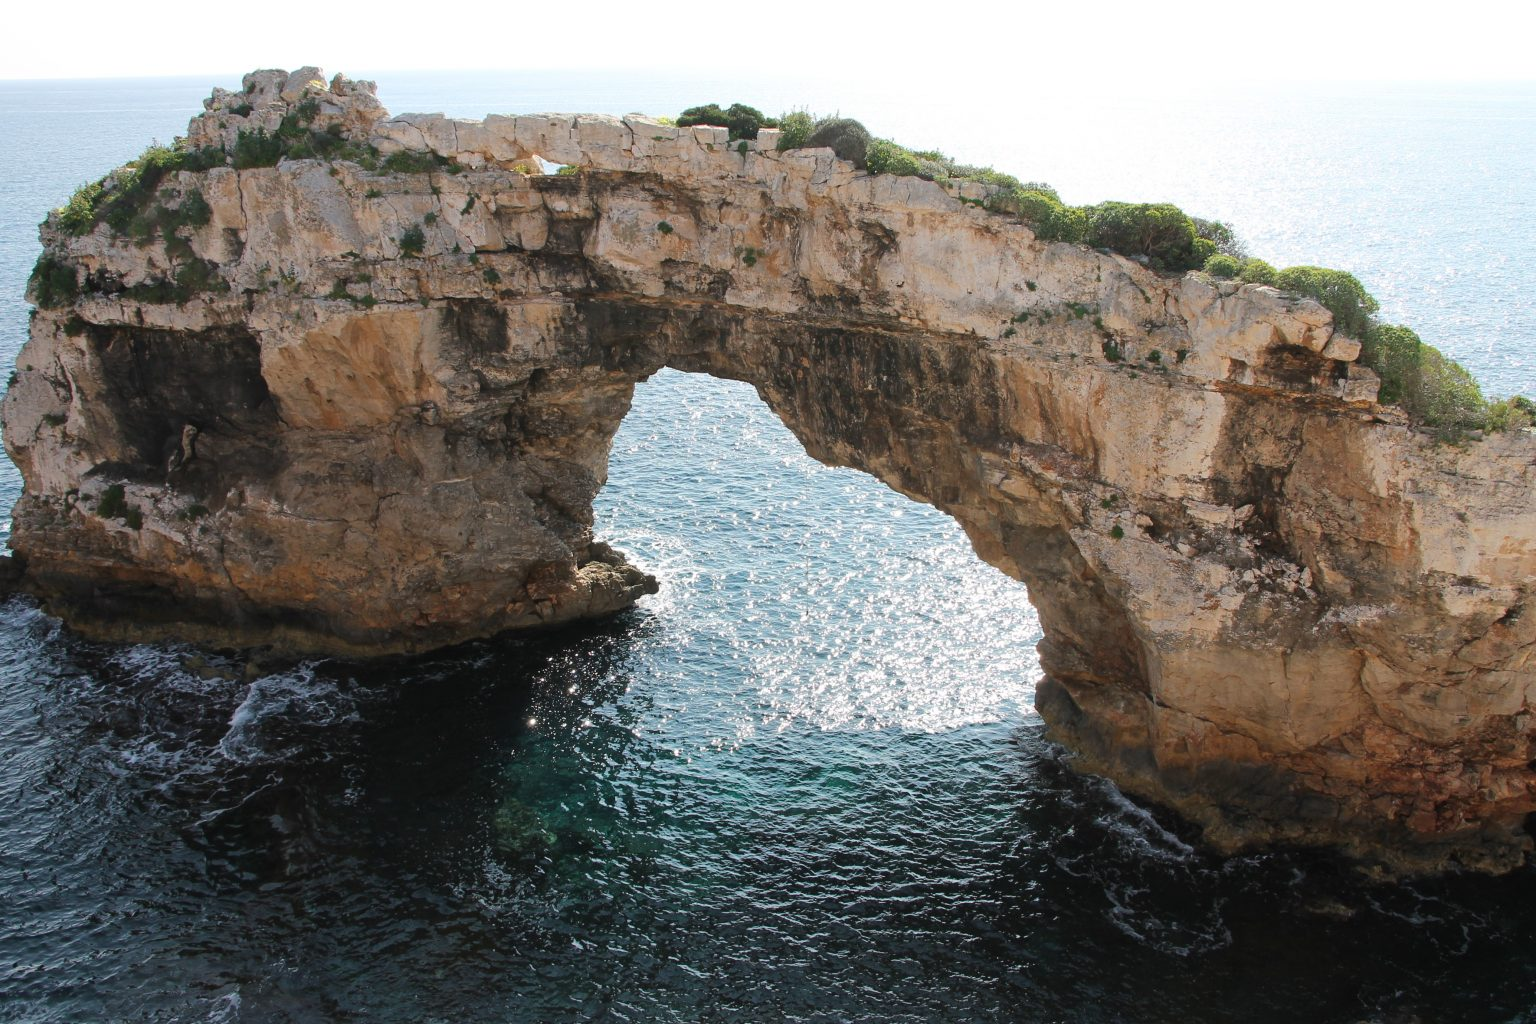 Wanderroute Mallorca Empfehlung